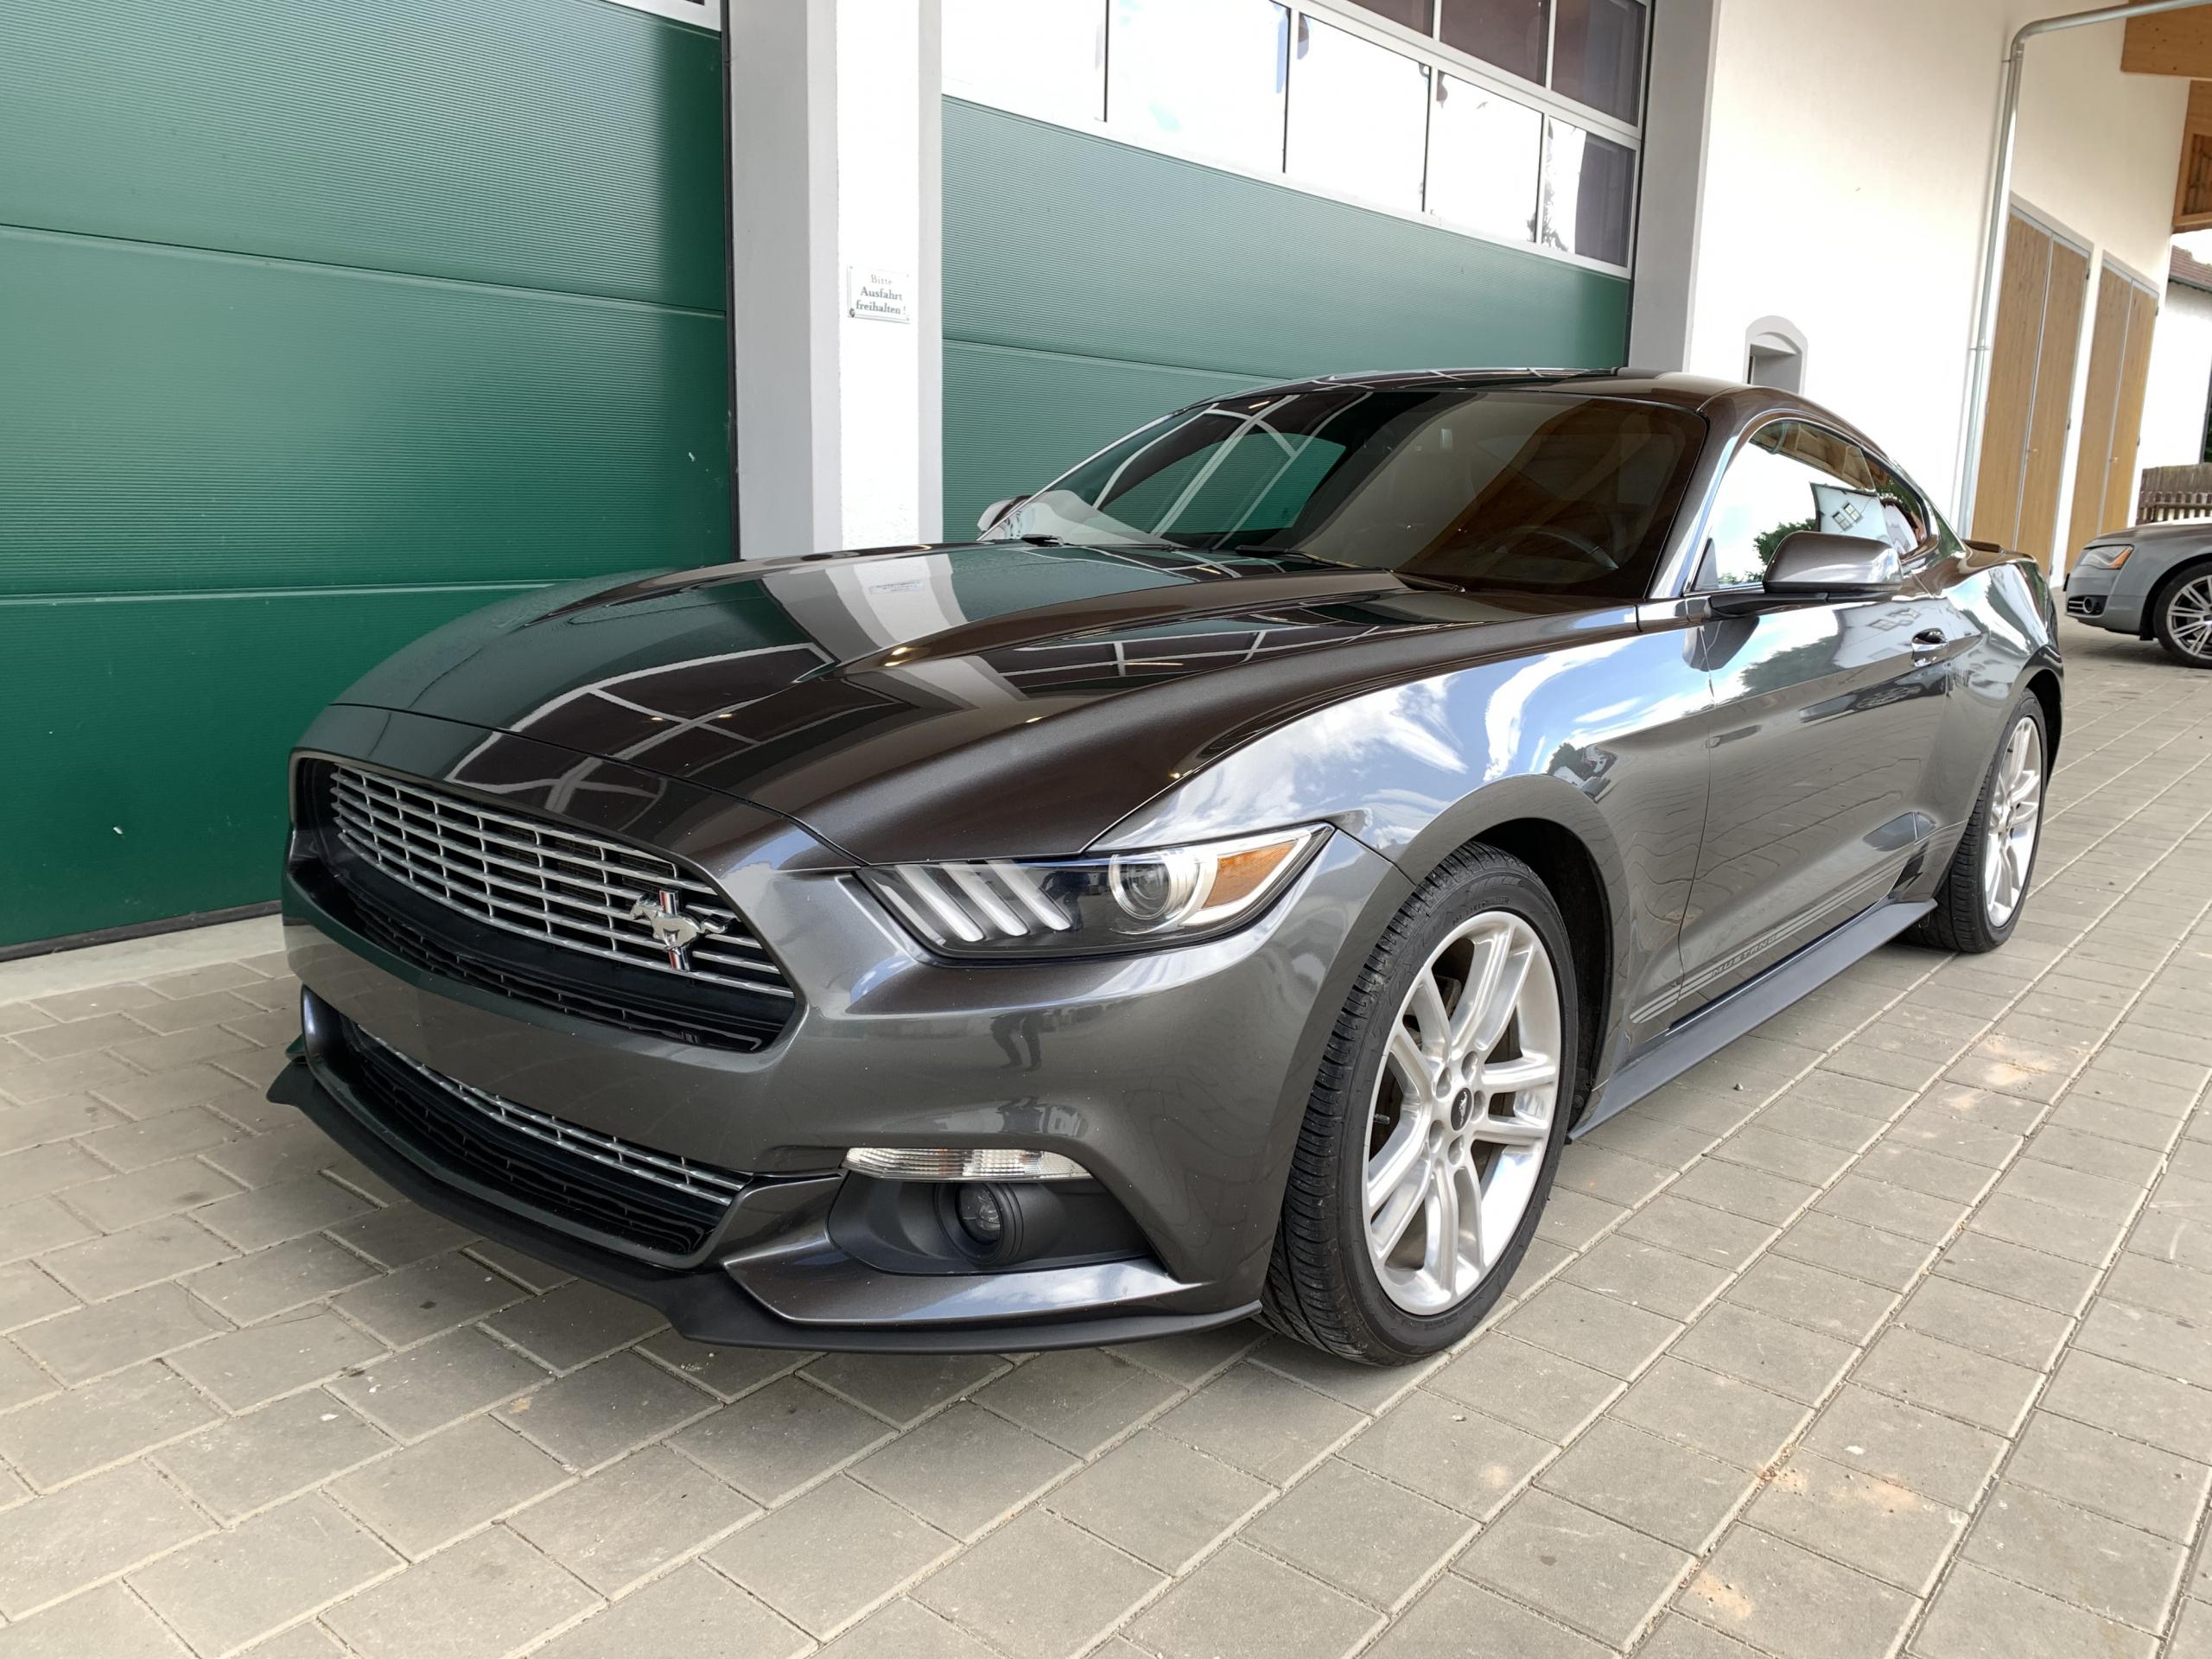 2017 Ford Mustang 2.3 EcoBoost Premium unfallfrei